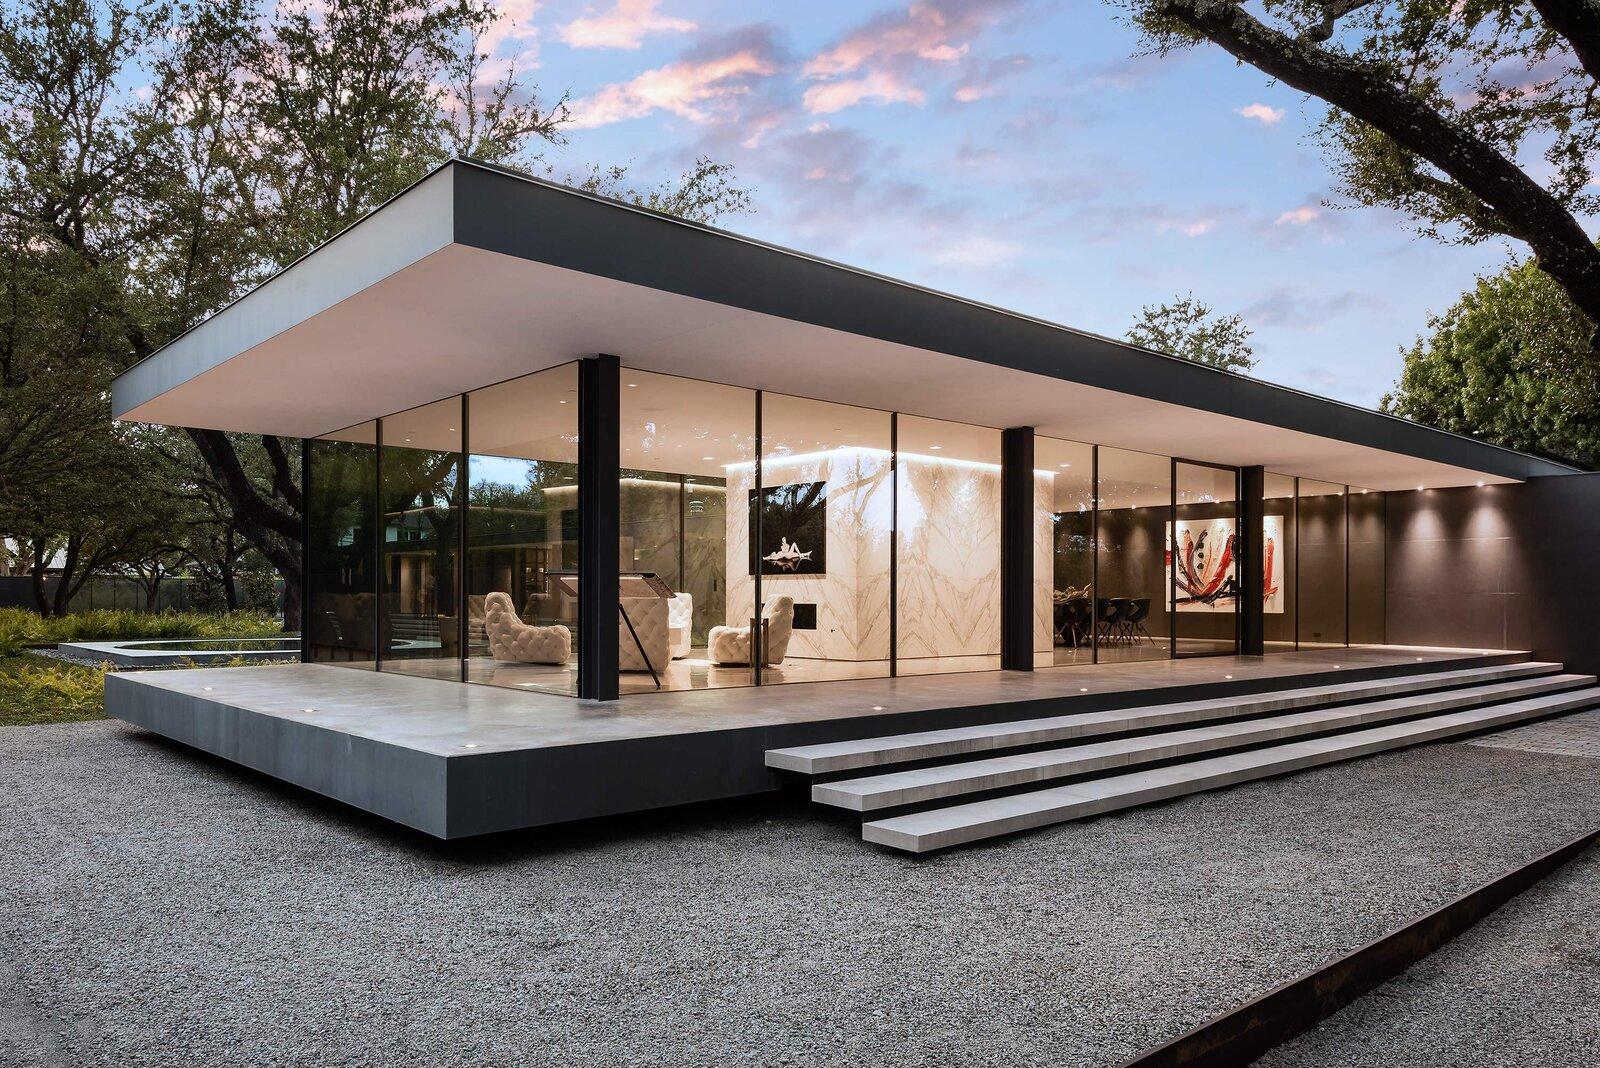 Photo 1 of 10 in A Farnsworth-Inspired Contemporary Home in Dallas Asks $7.9M